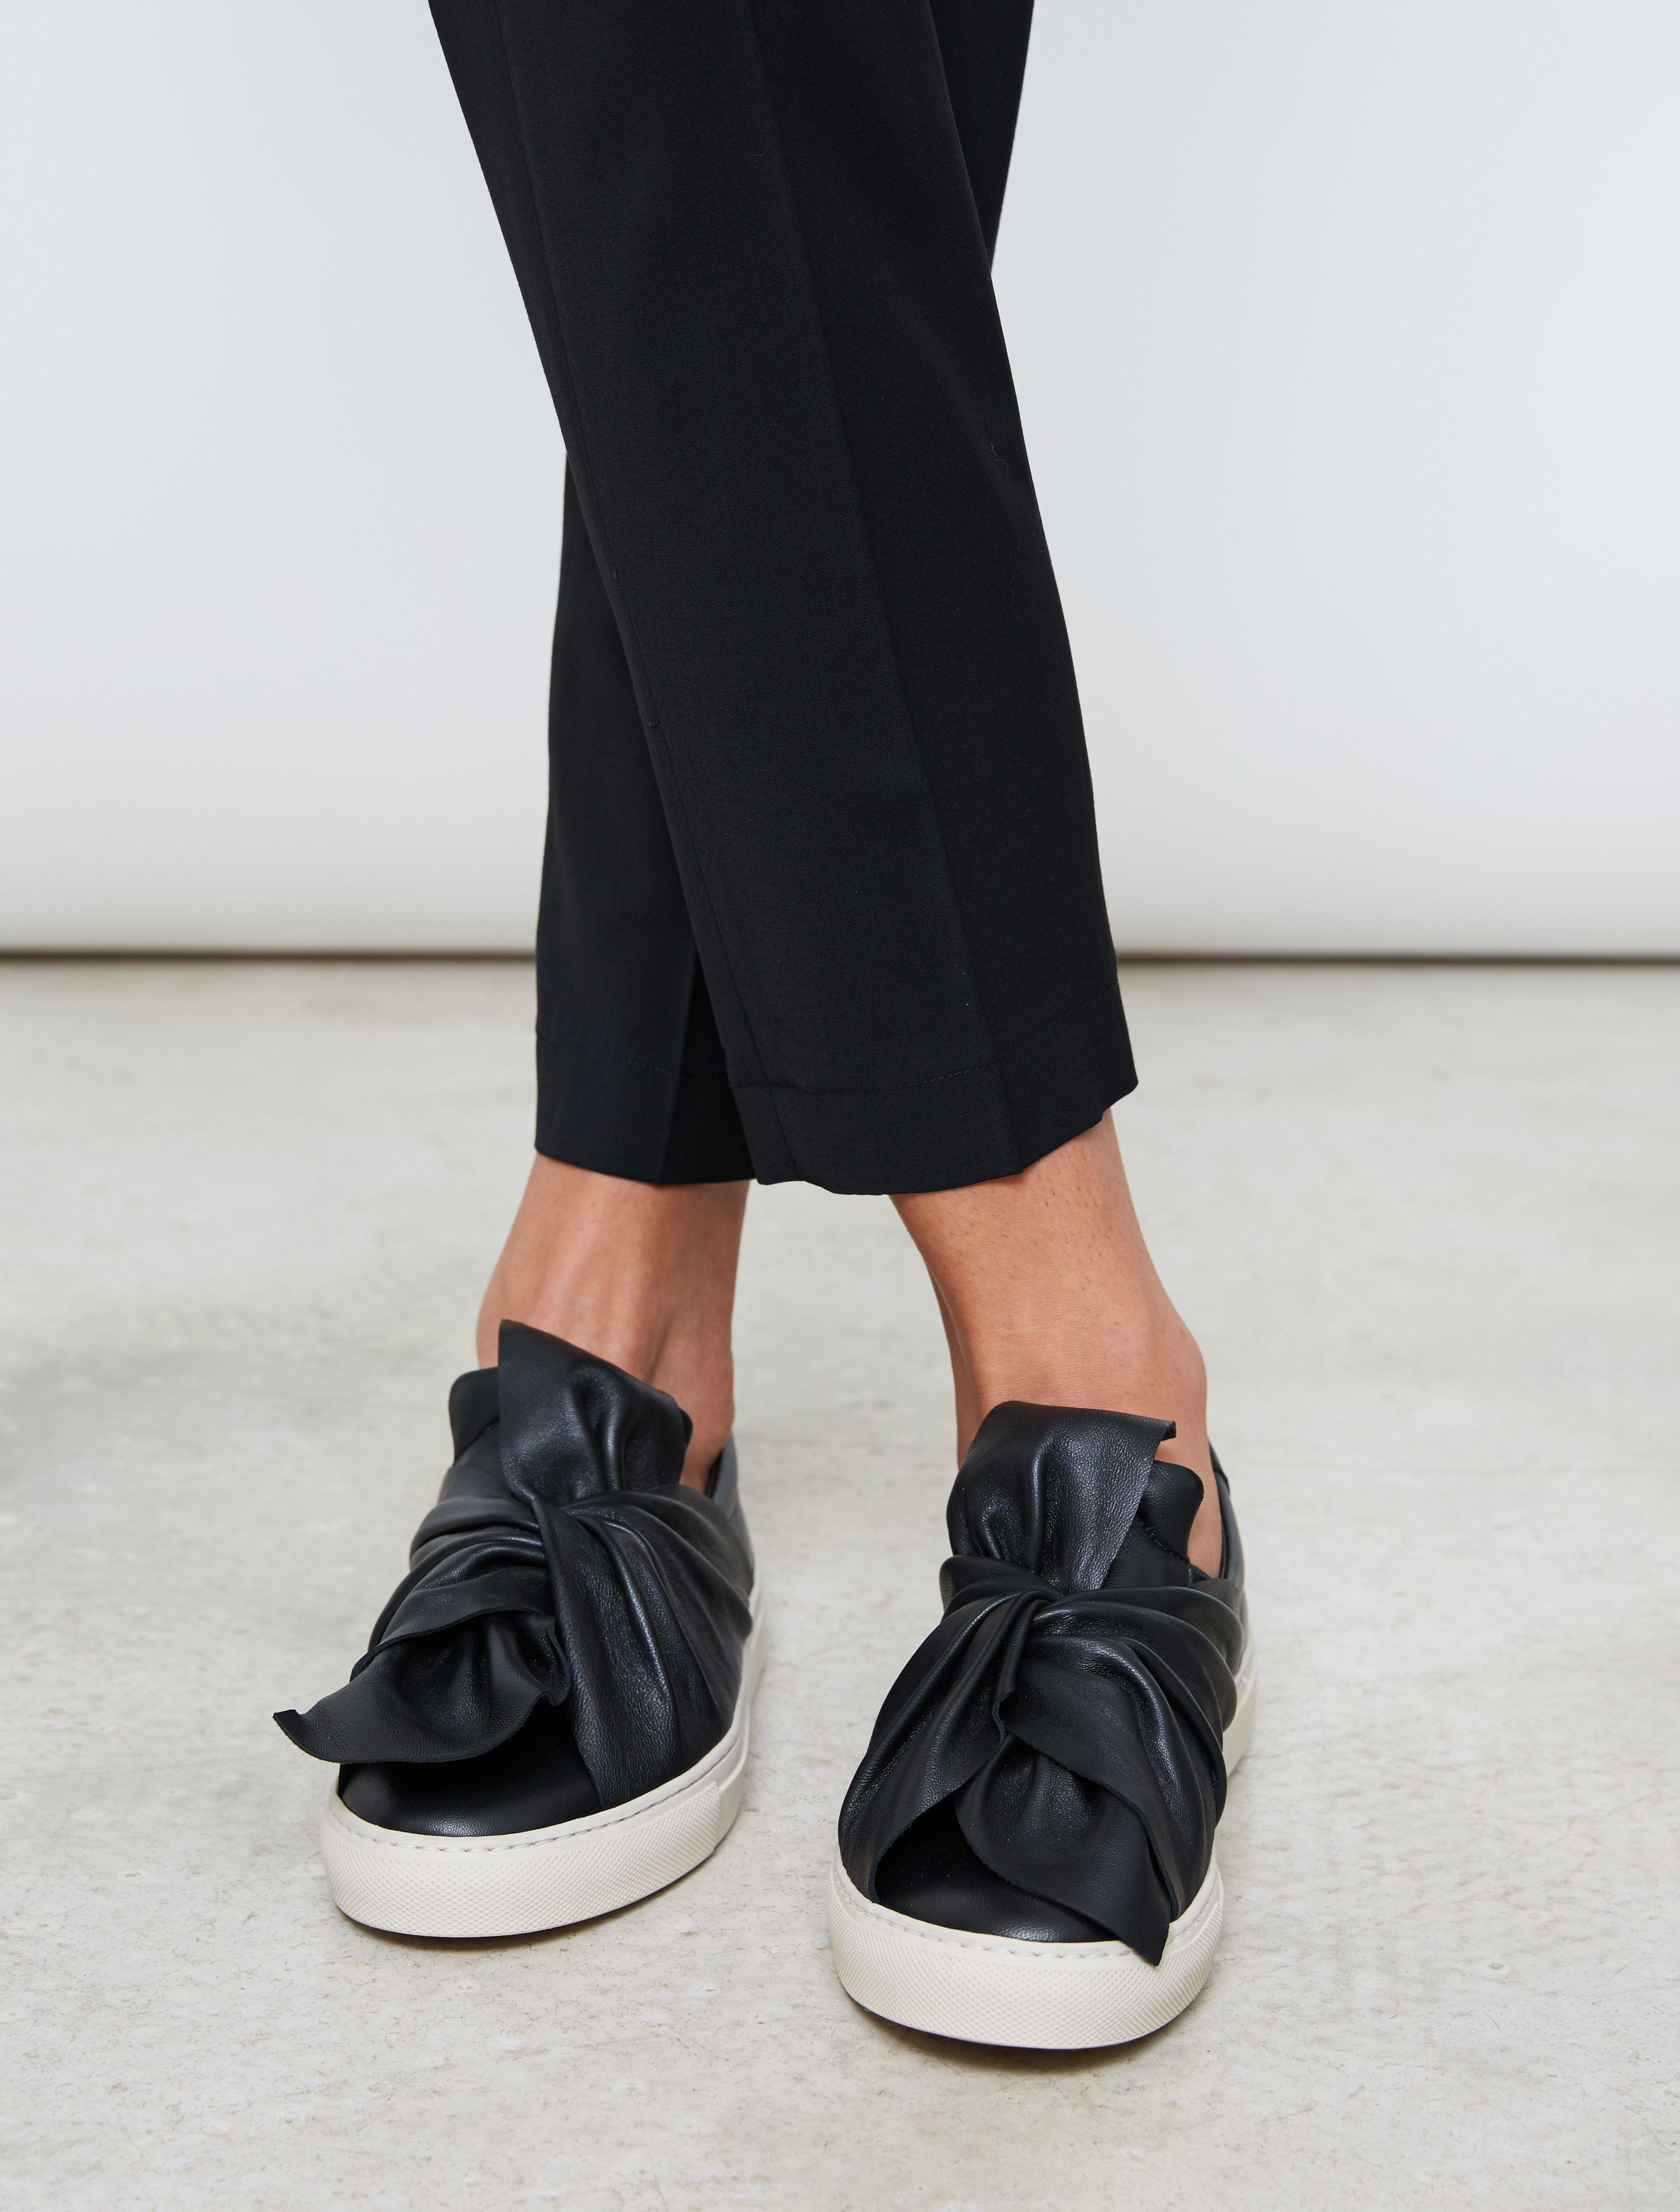 Ports 1961 Bow Sneakers Black WOMEN'S